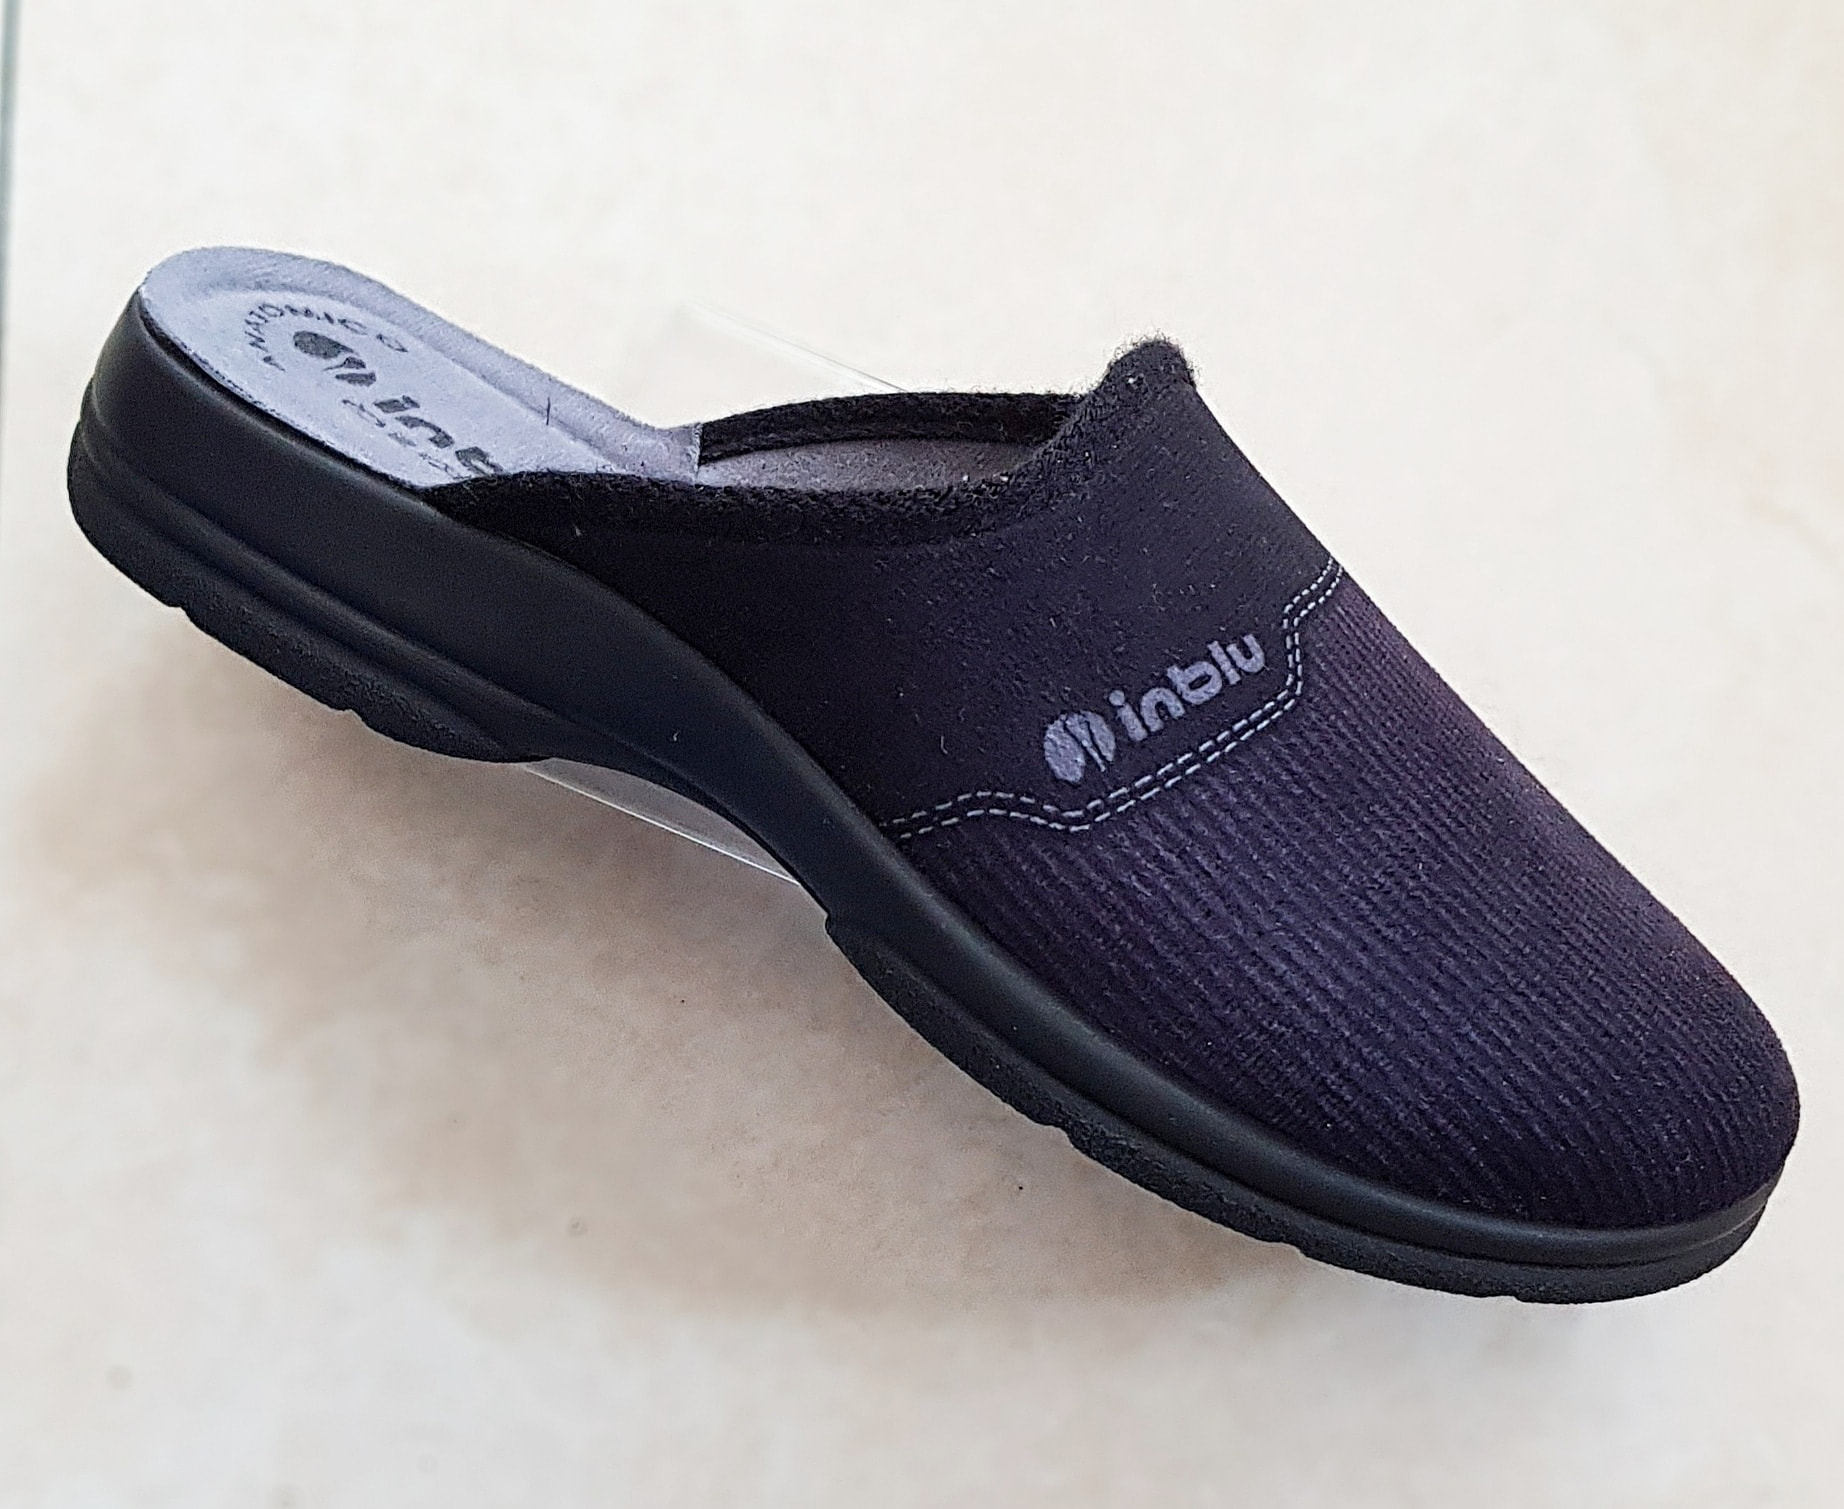 inblu-pantofola-uomo-col-nero